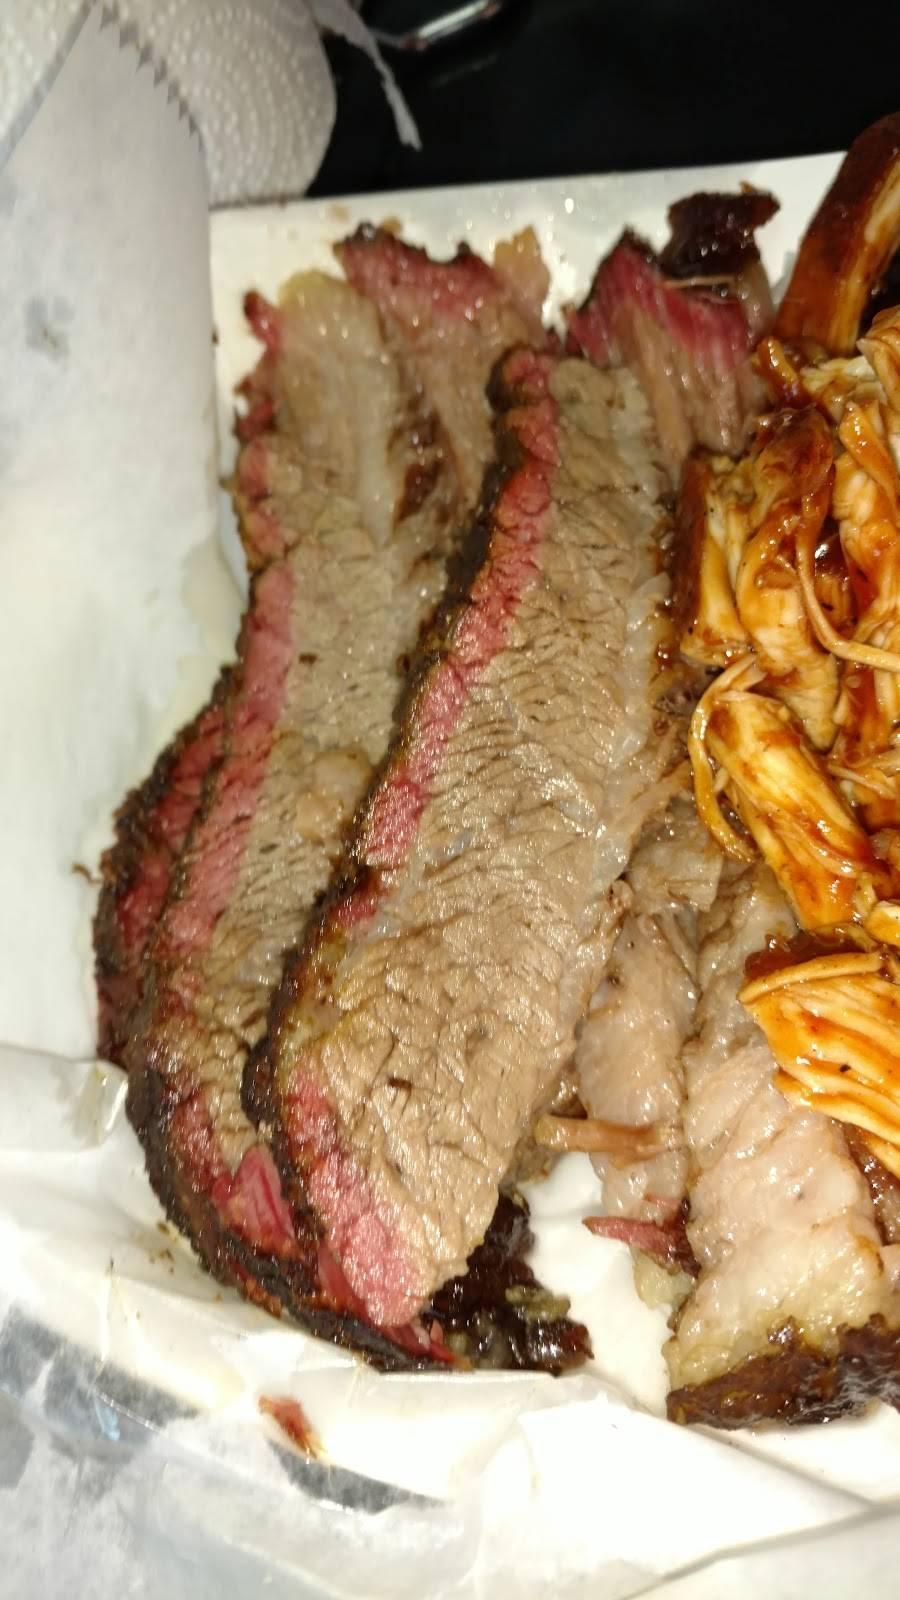 Harleys Hardwoodz BBQ - restaurant  | Photo 6 of 10 | Address: 1611 Charlestown New Albany Rd, Jeffersonville, IN 47130, USA | Phone: (812) 284-4490